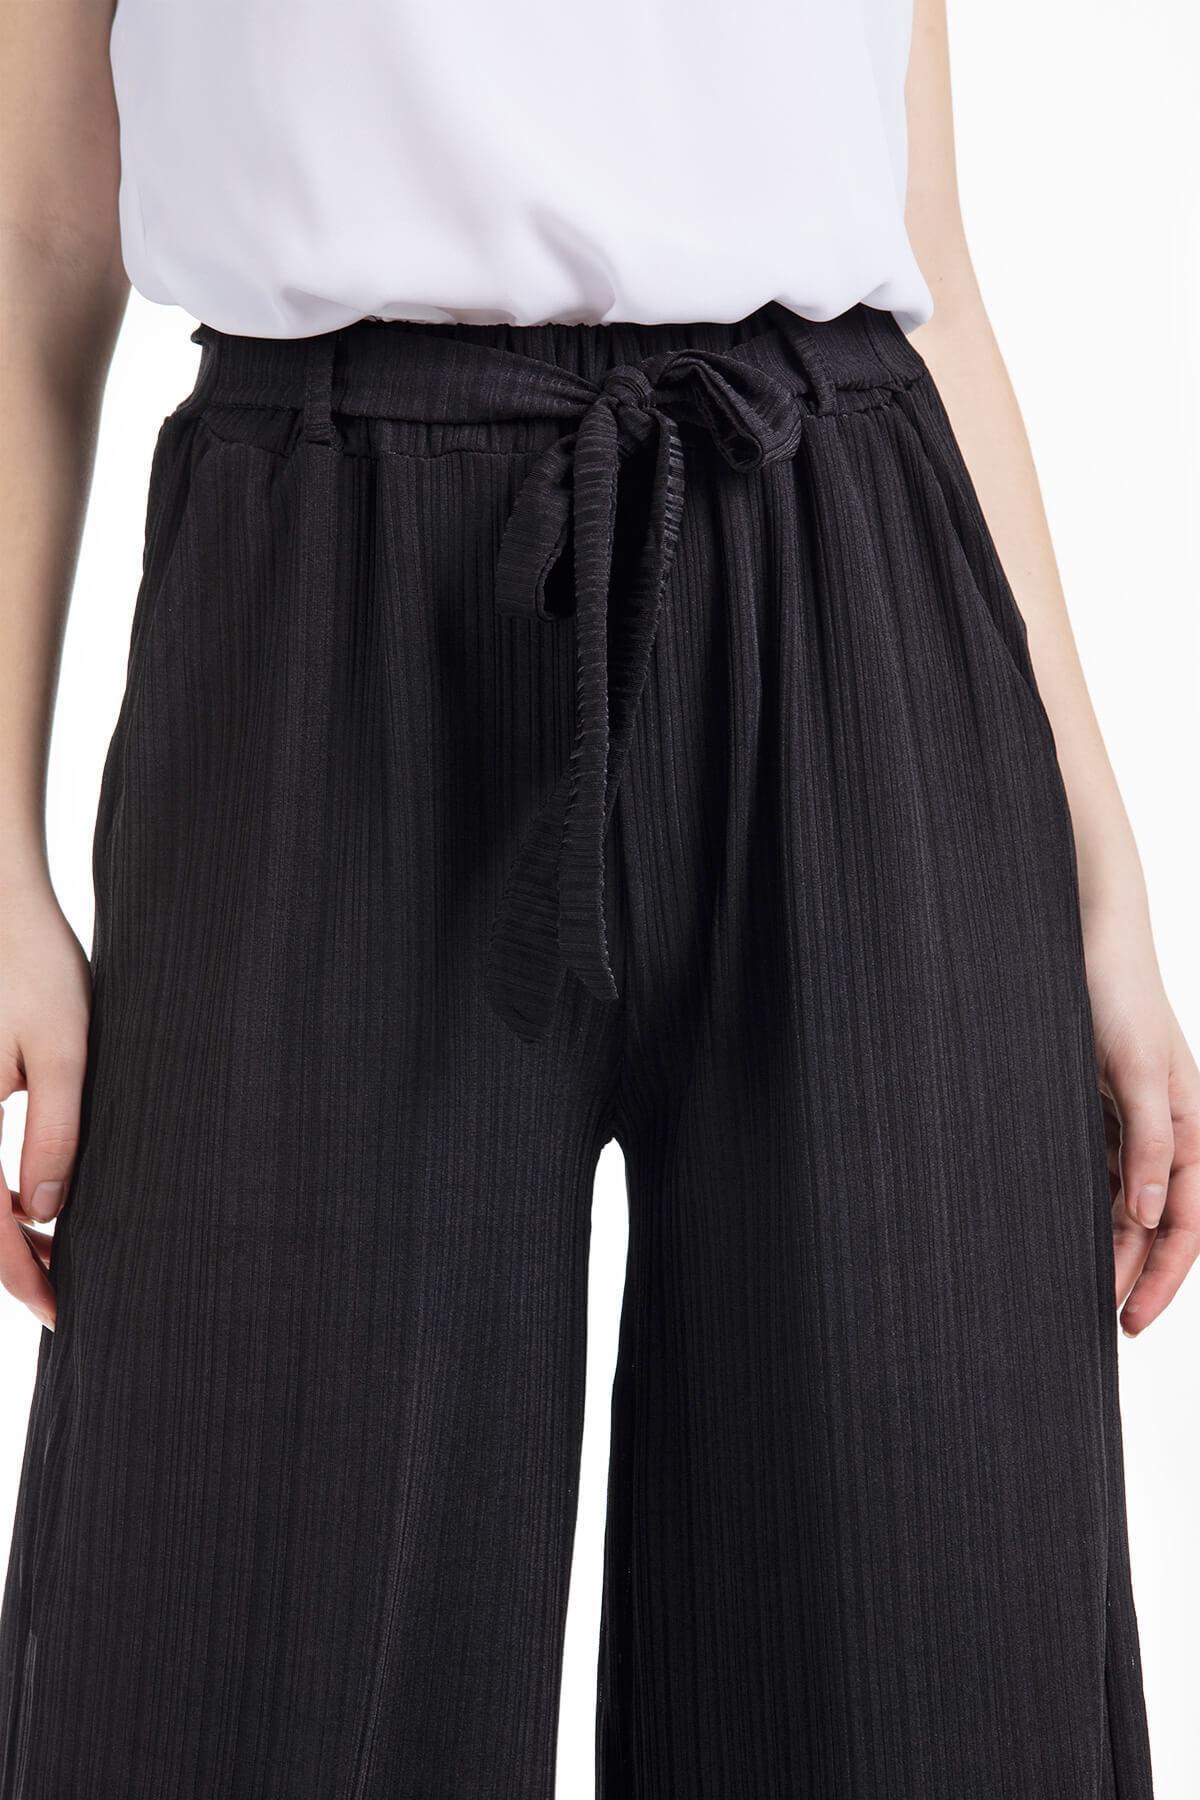 Mossta Kadın Siyah Likralı Kaşkorse Salaş Pantolon 2